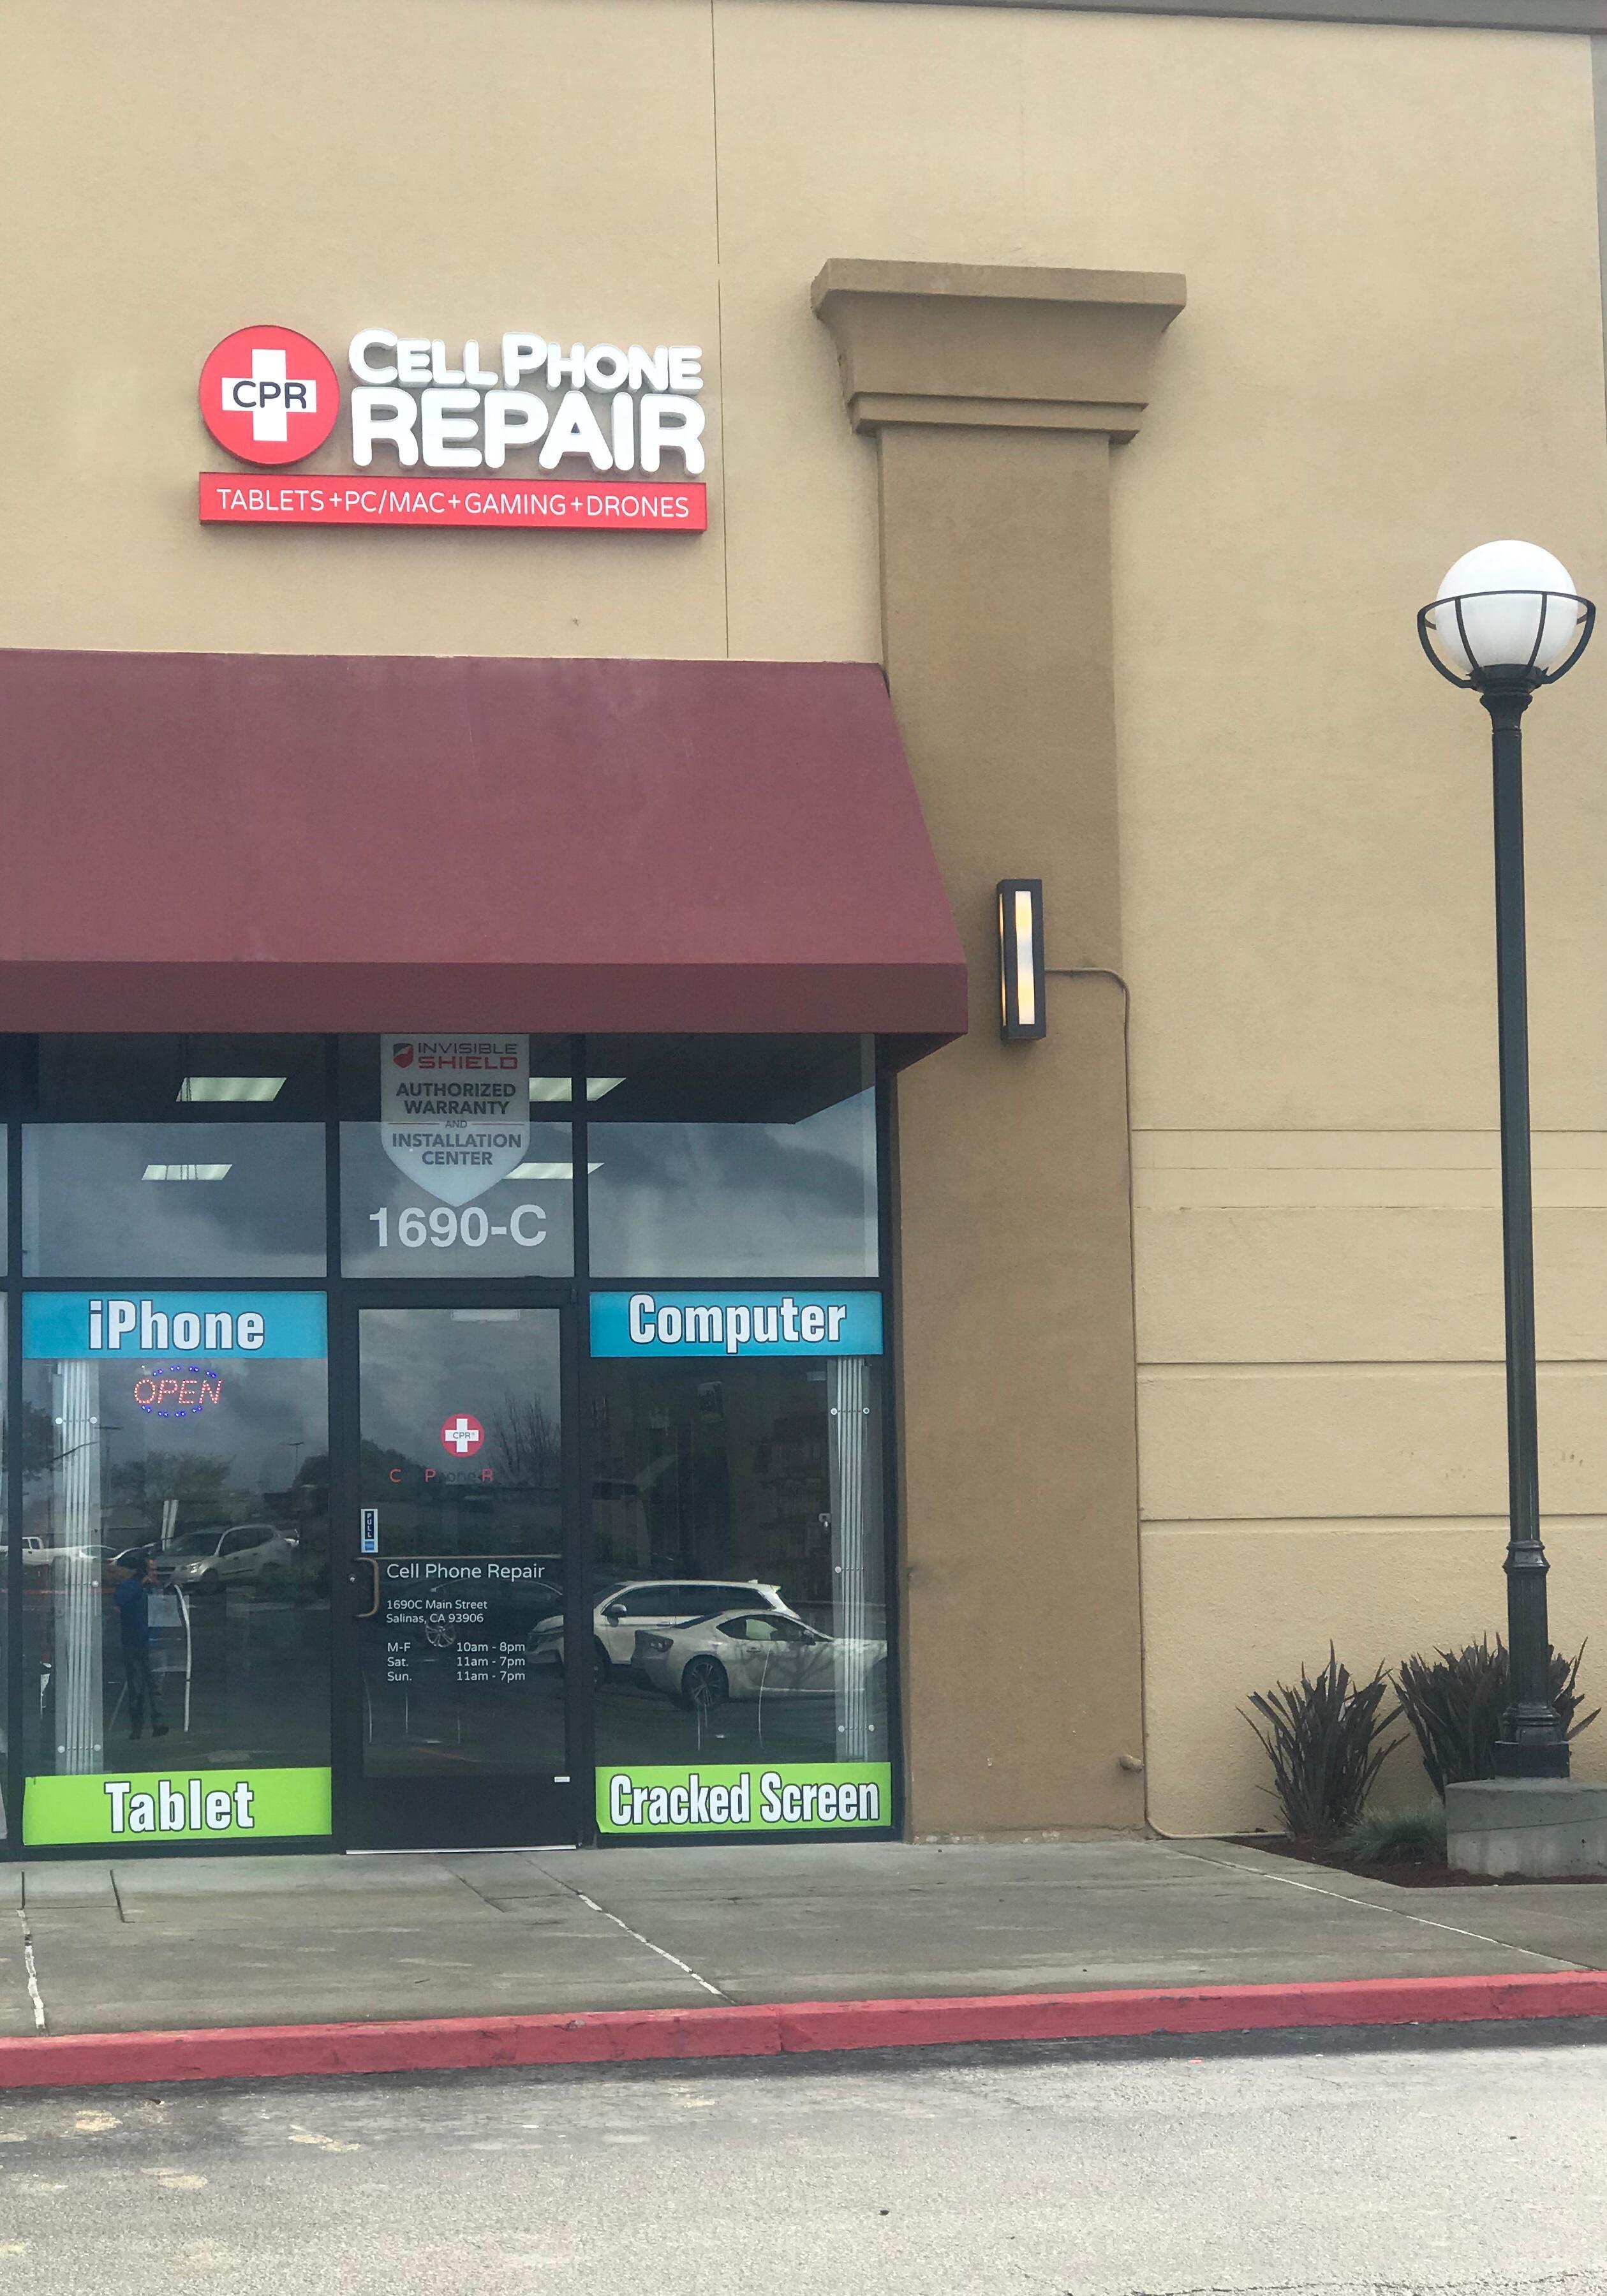 CPR Cell Phone Repair Salinas - North image 0